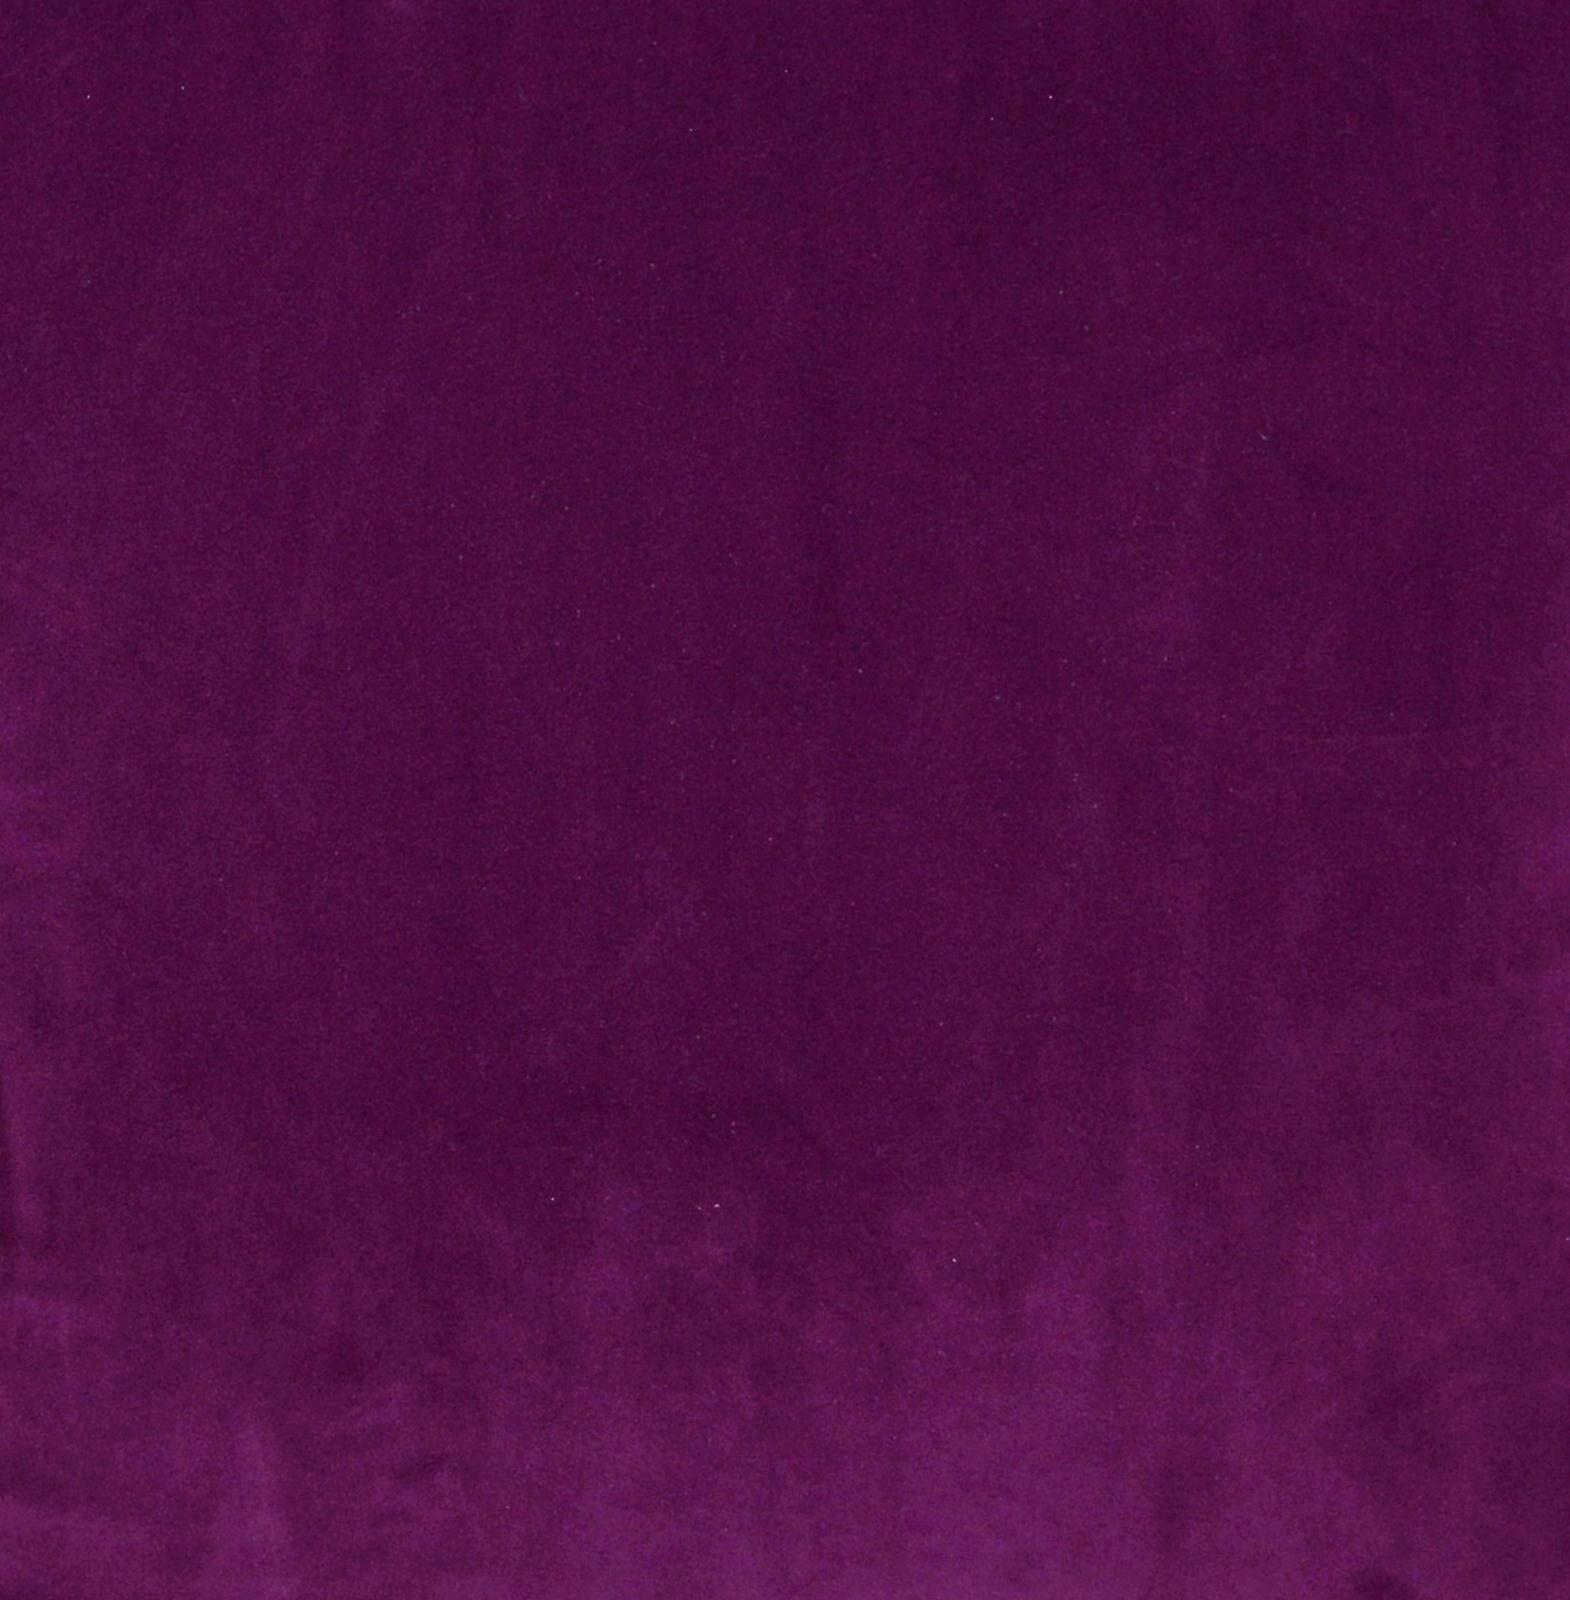 Mf51n Violet Plain Thick Microfiber Velvet Round Shape Cushion Cover Custom Size